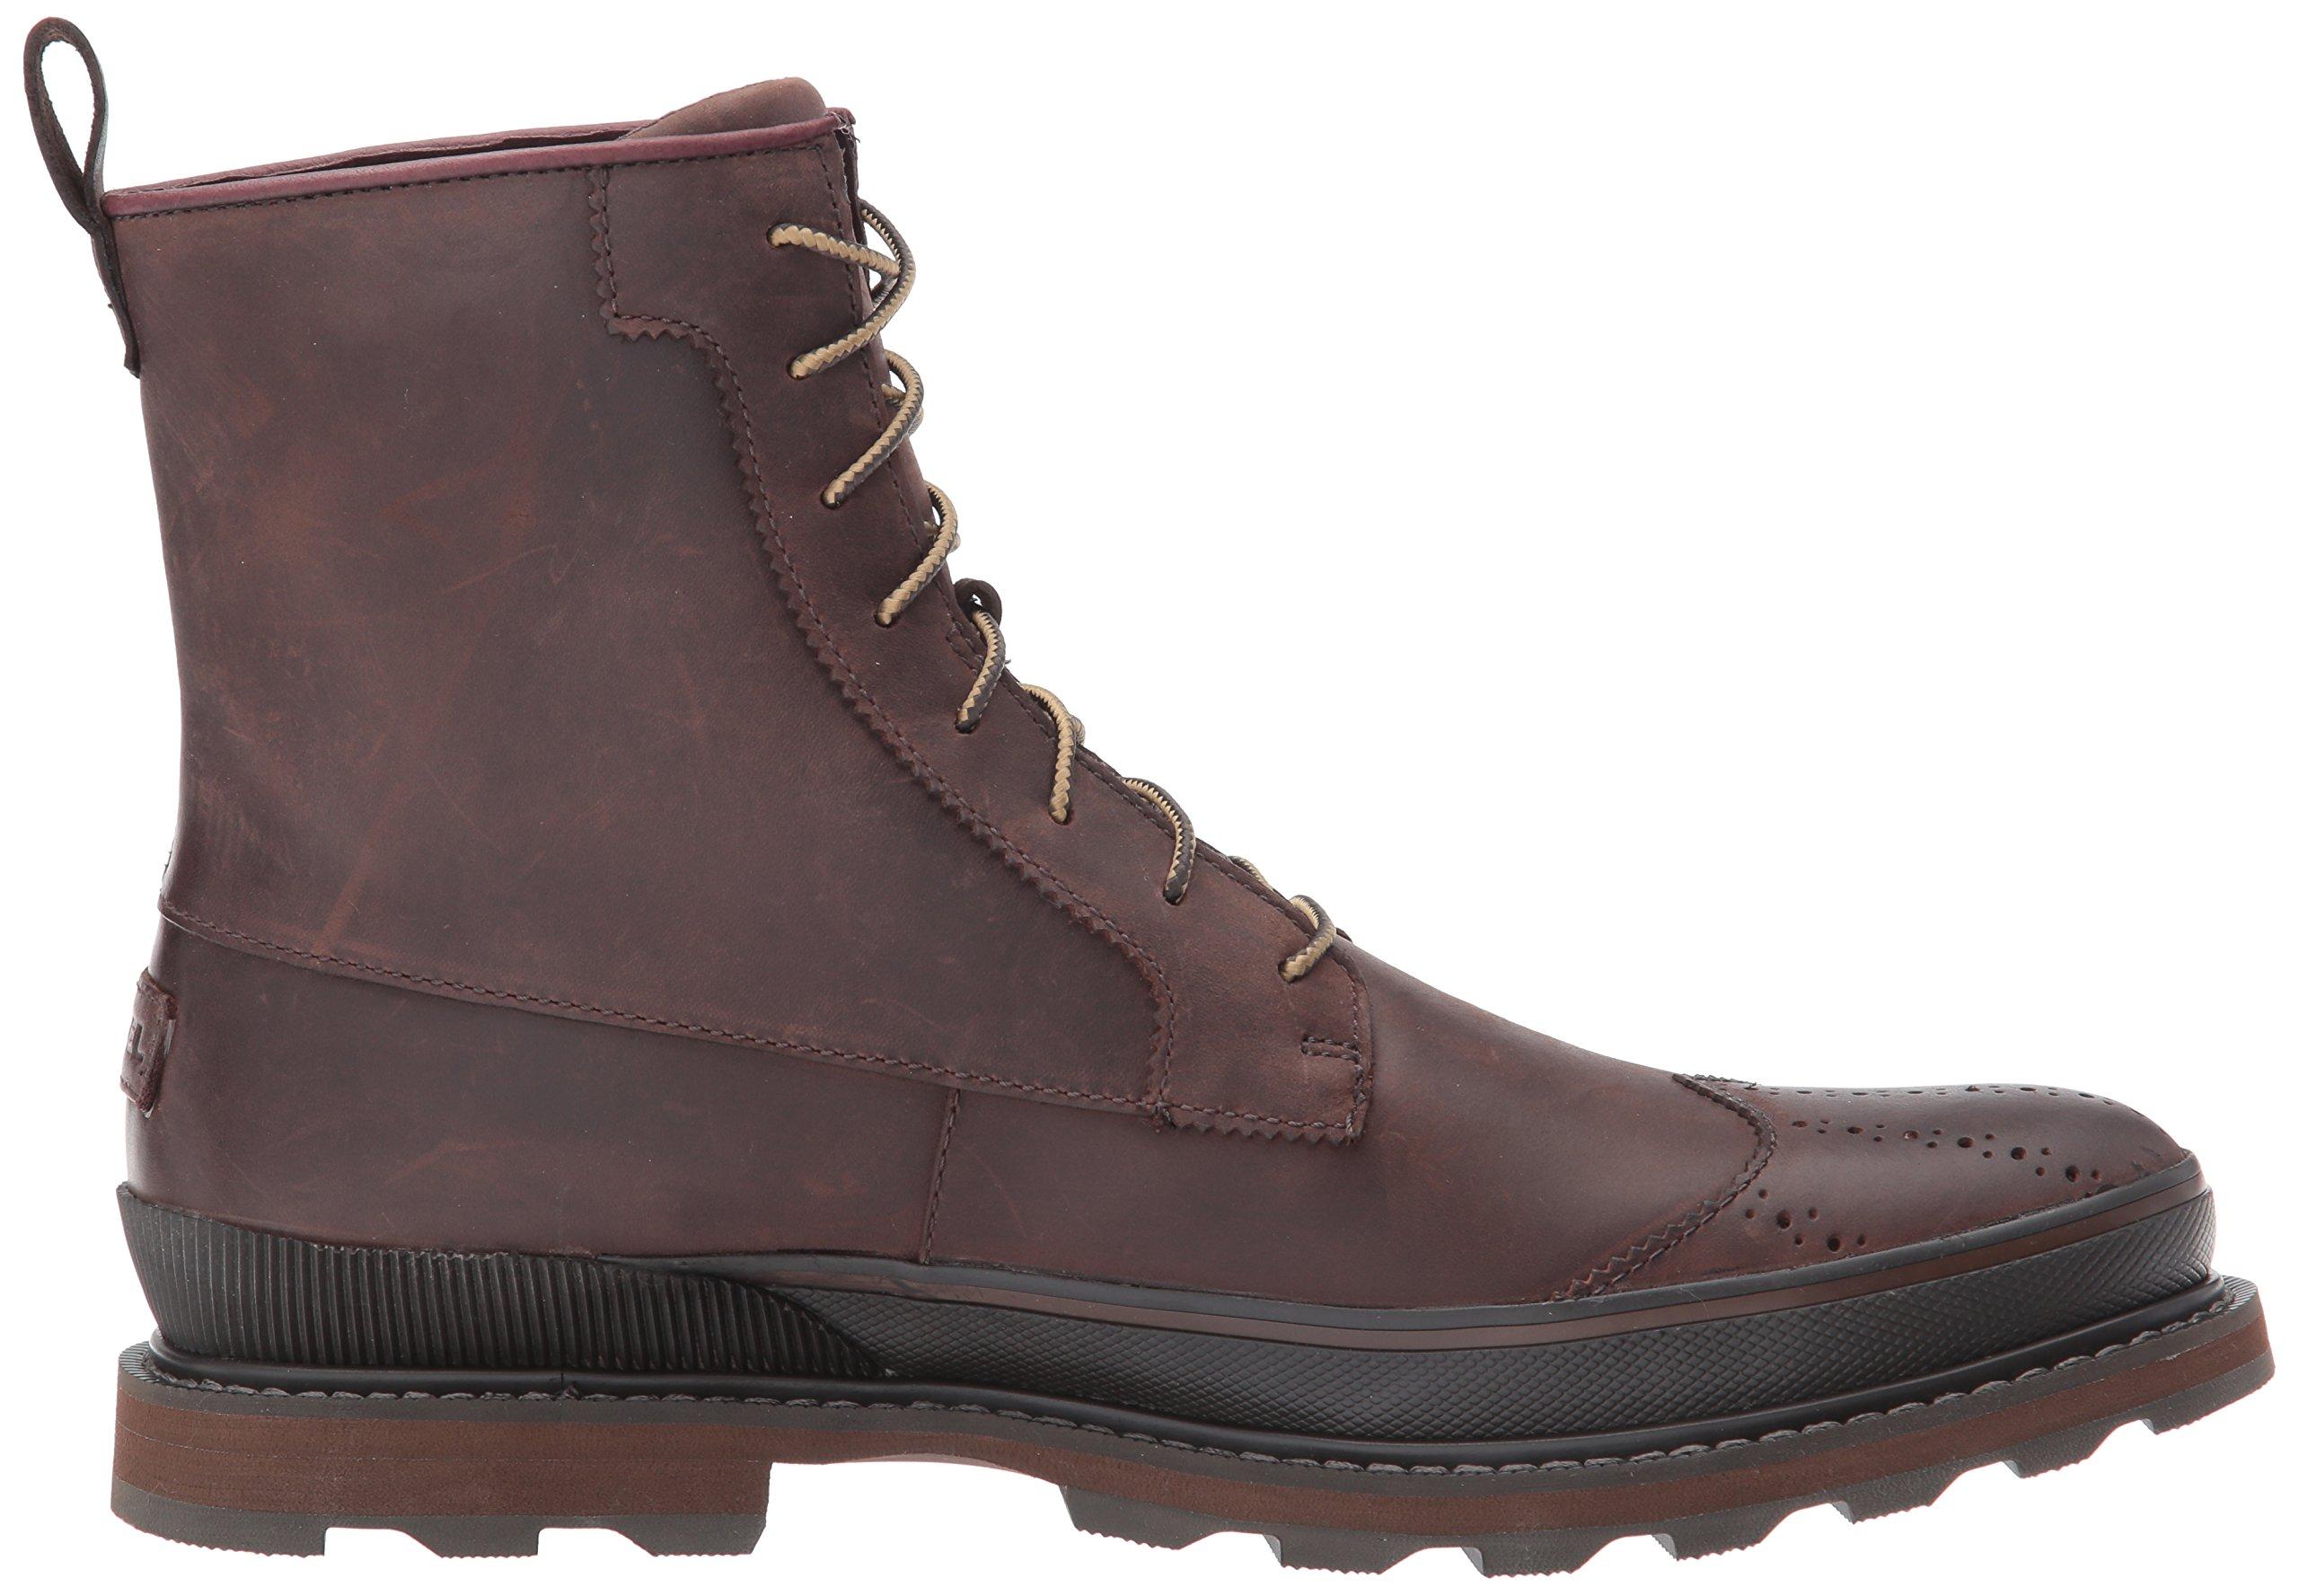 Madson Wingtip Boot Waterproof Oxford